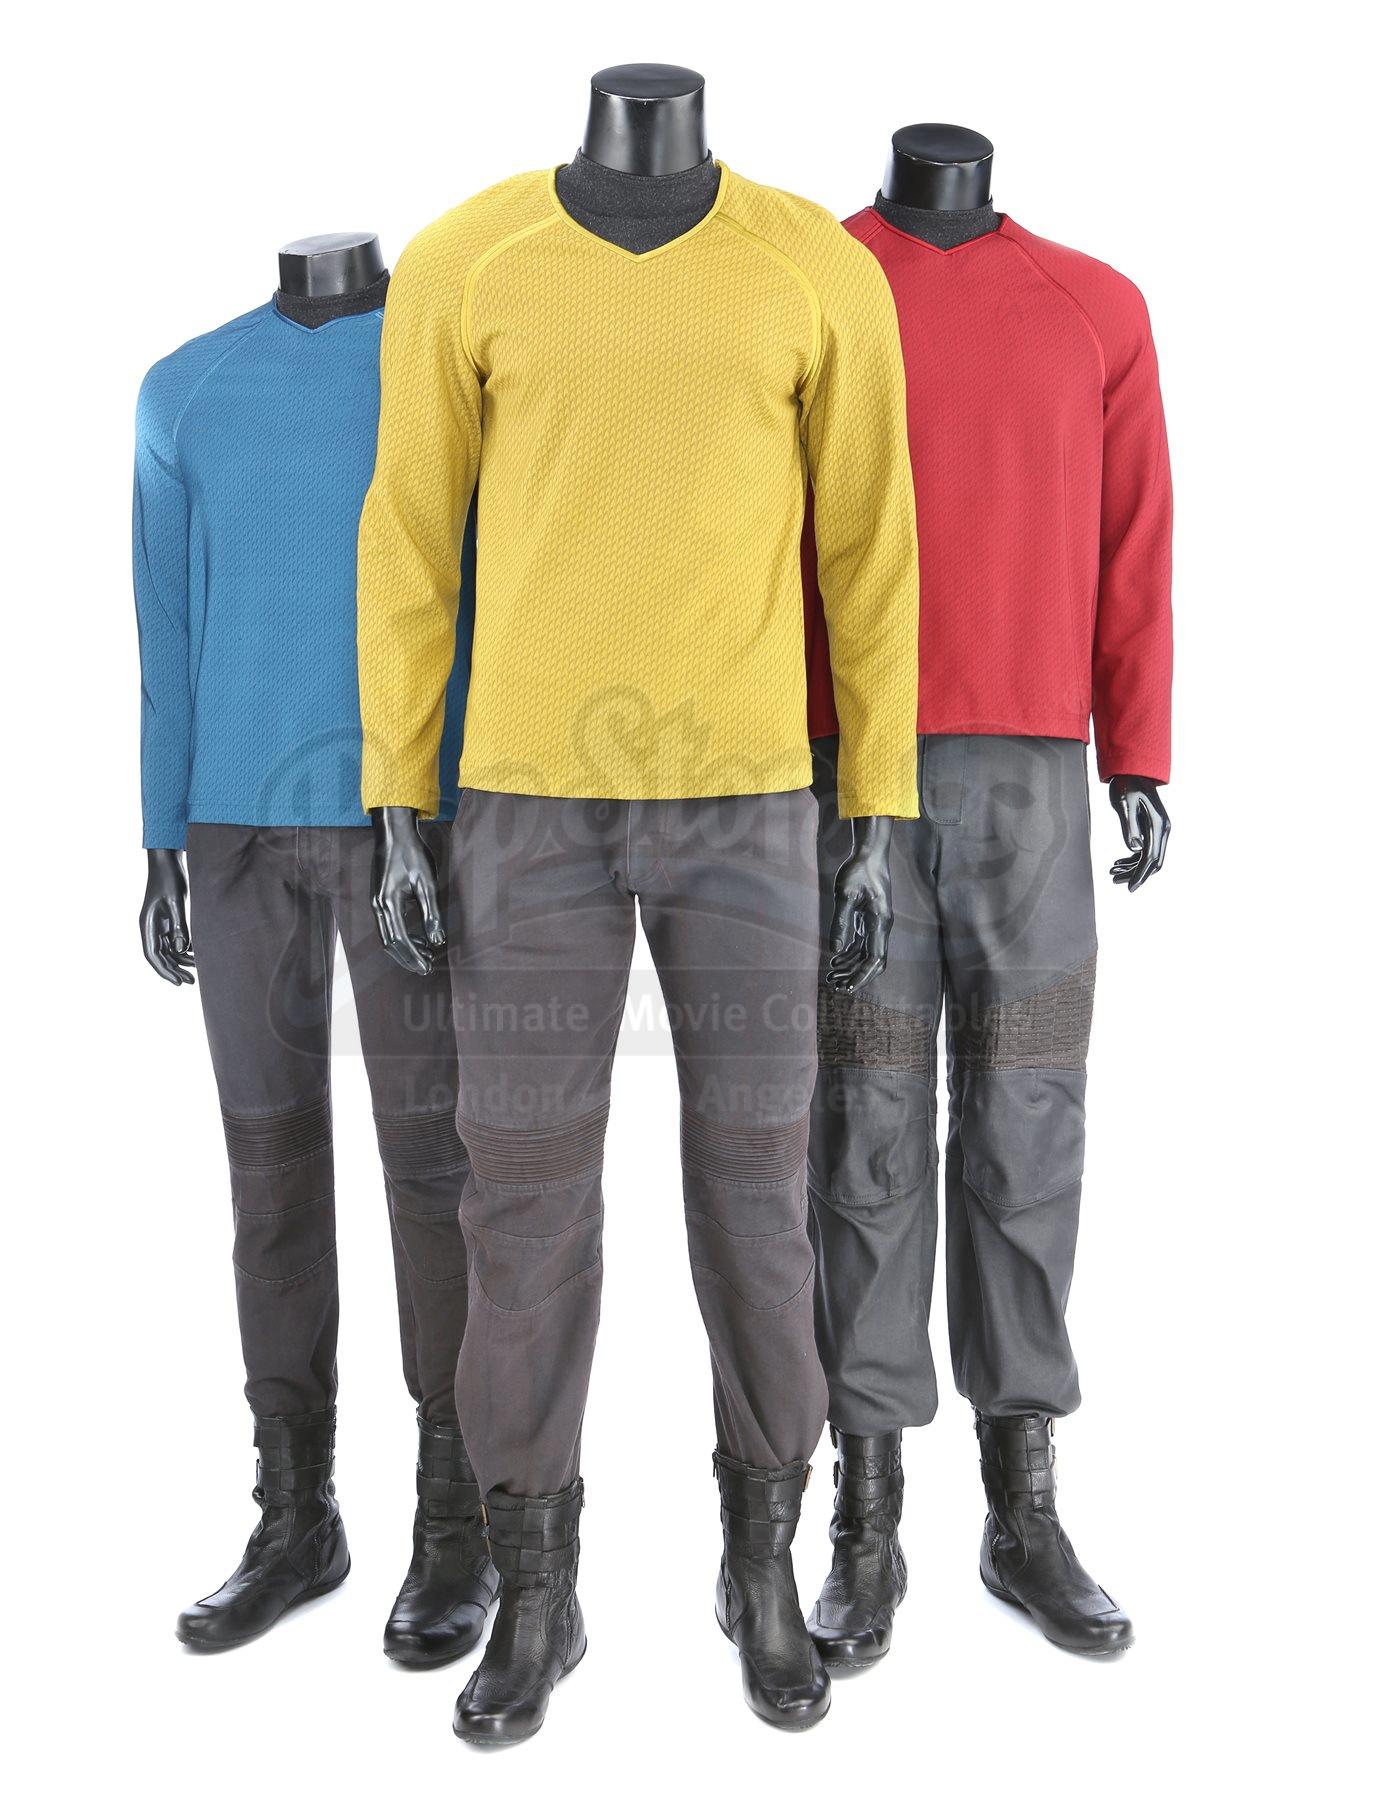 Star Trek Into Darkness Red Shirt Cos Star Fleet Command Team Tunic Uniforms New